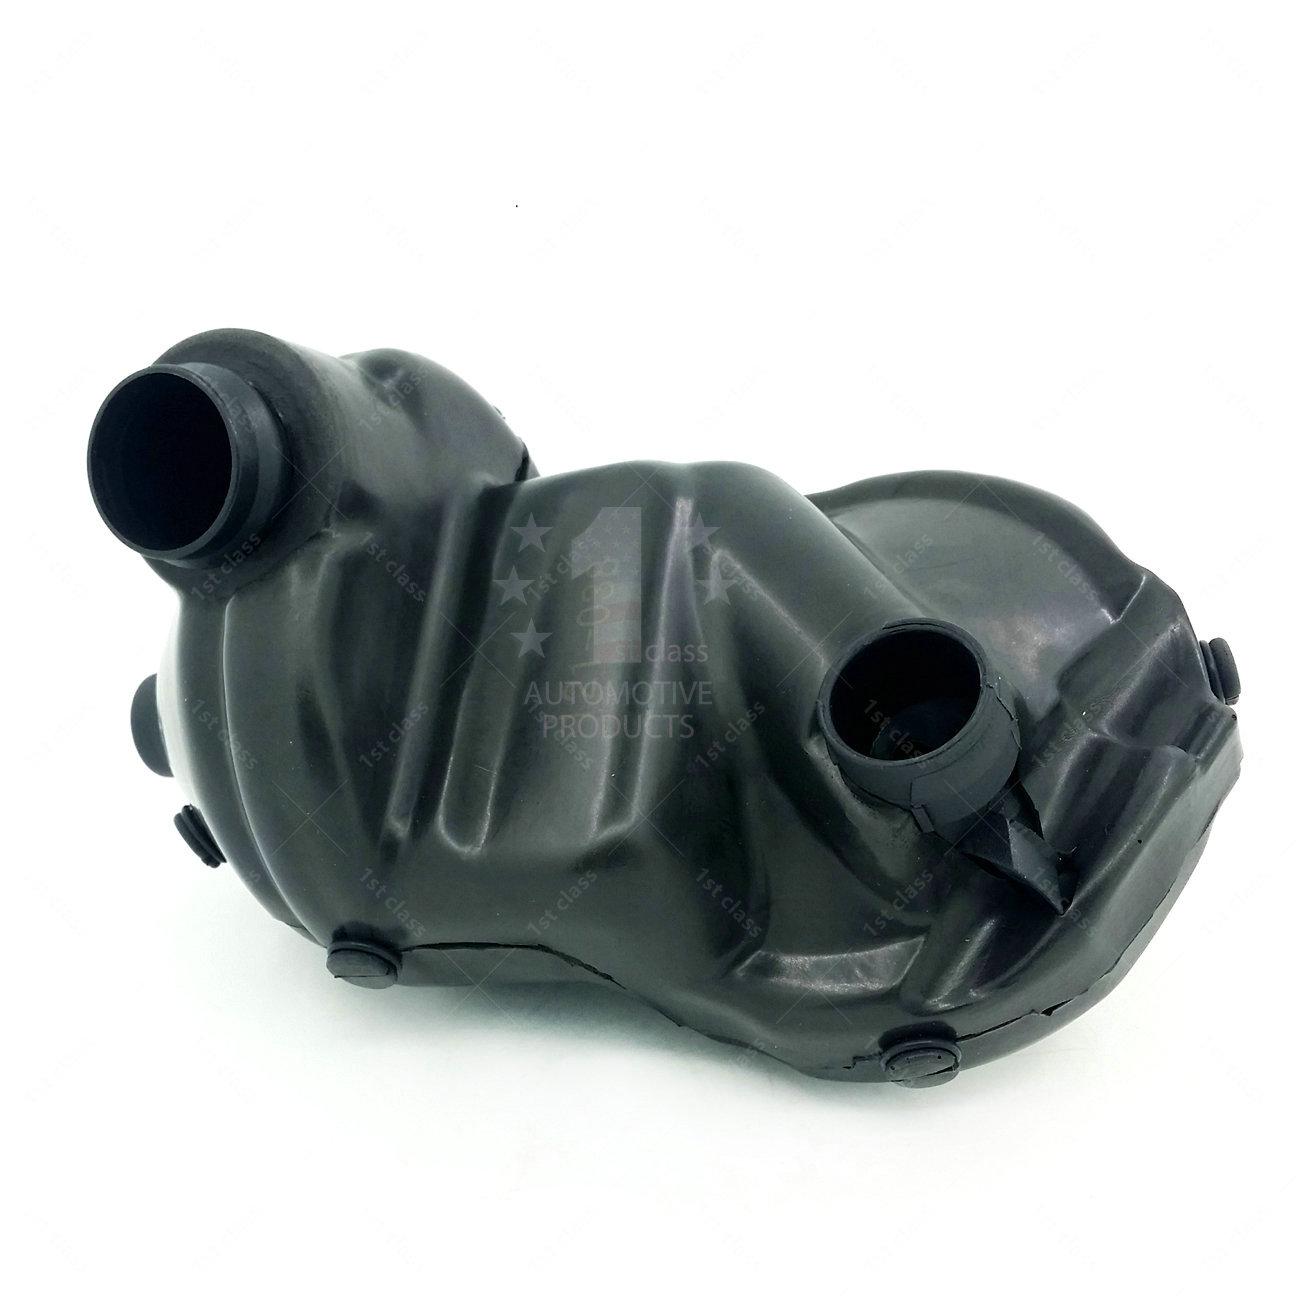 MGPRO New 1pc Engine Crankcase Vent Valve PCV For BMW 320 325 328 330 528 530 E46 E53 320i 323Ci 323i 325Ci 325i 325xi 328Ci 328i 330Ci 330i 330xi 525i 528i 530i X3 Z3 Z4